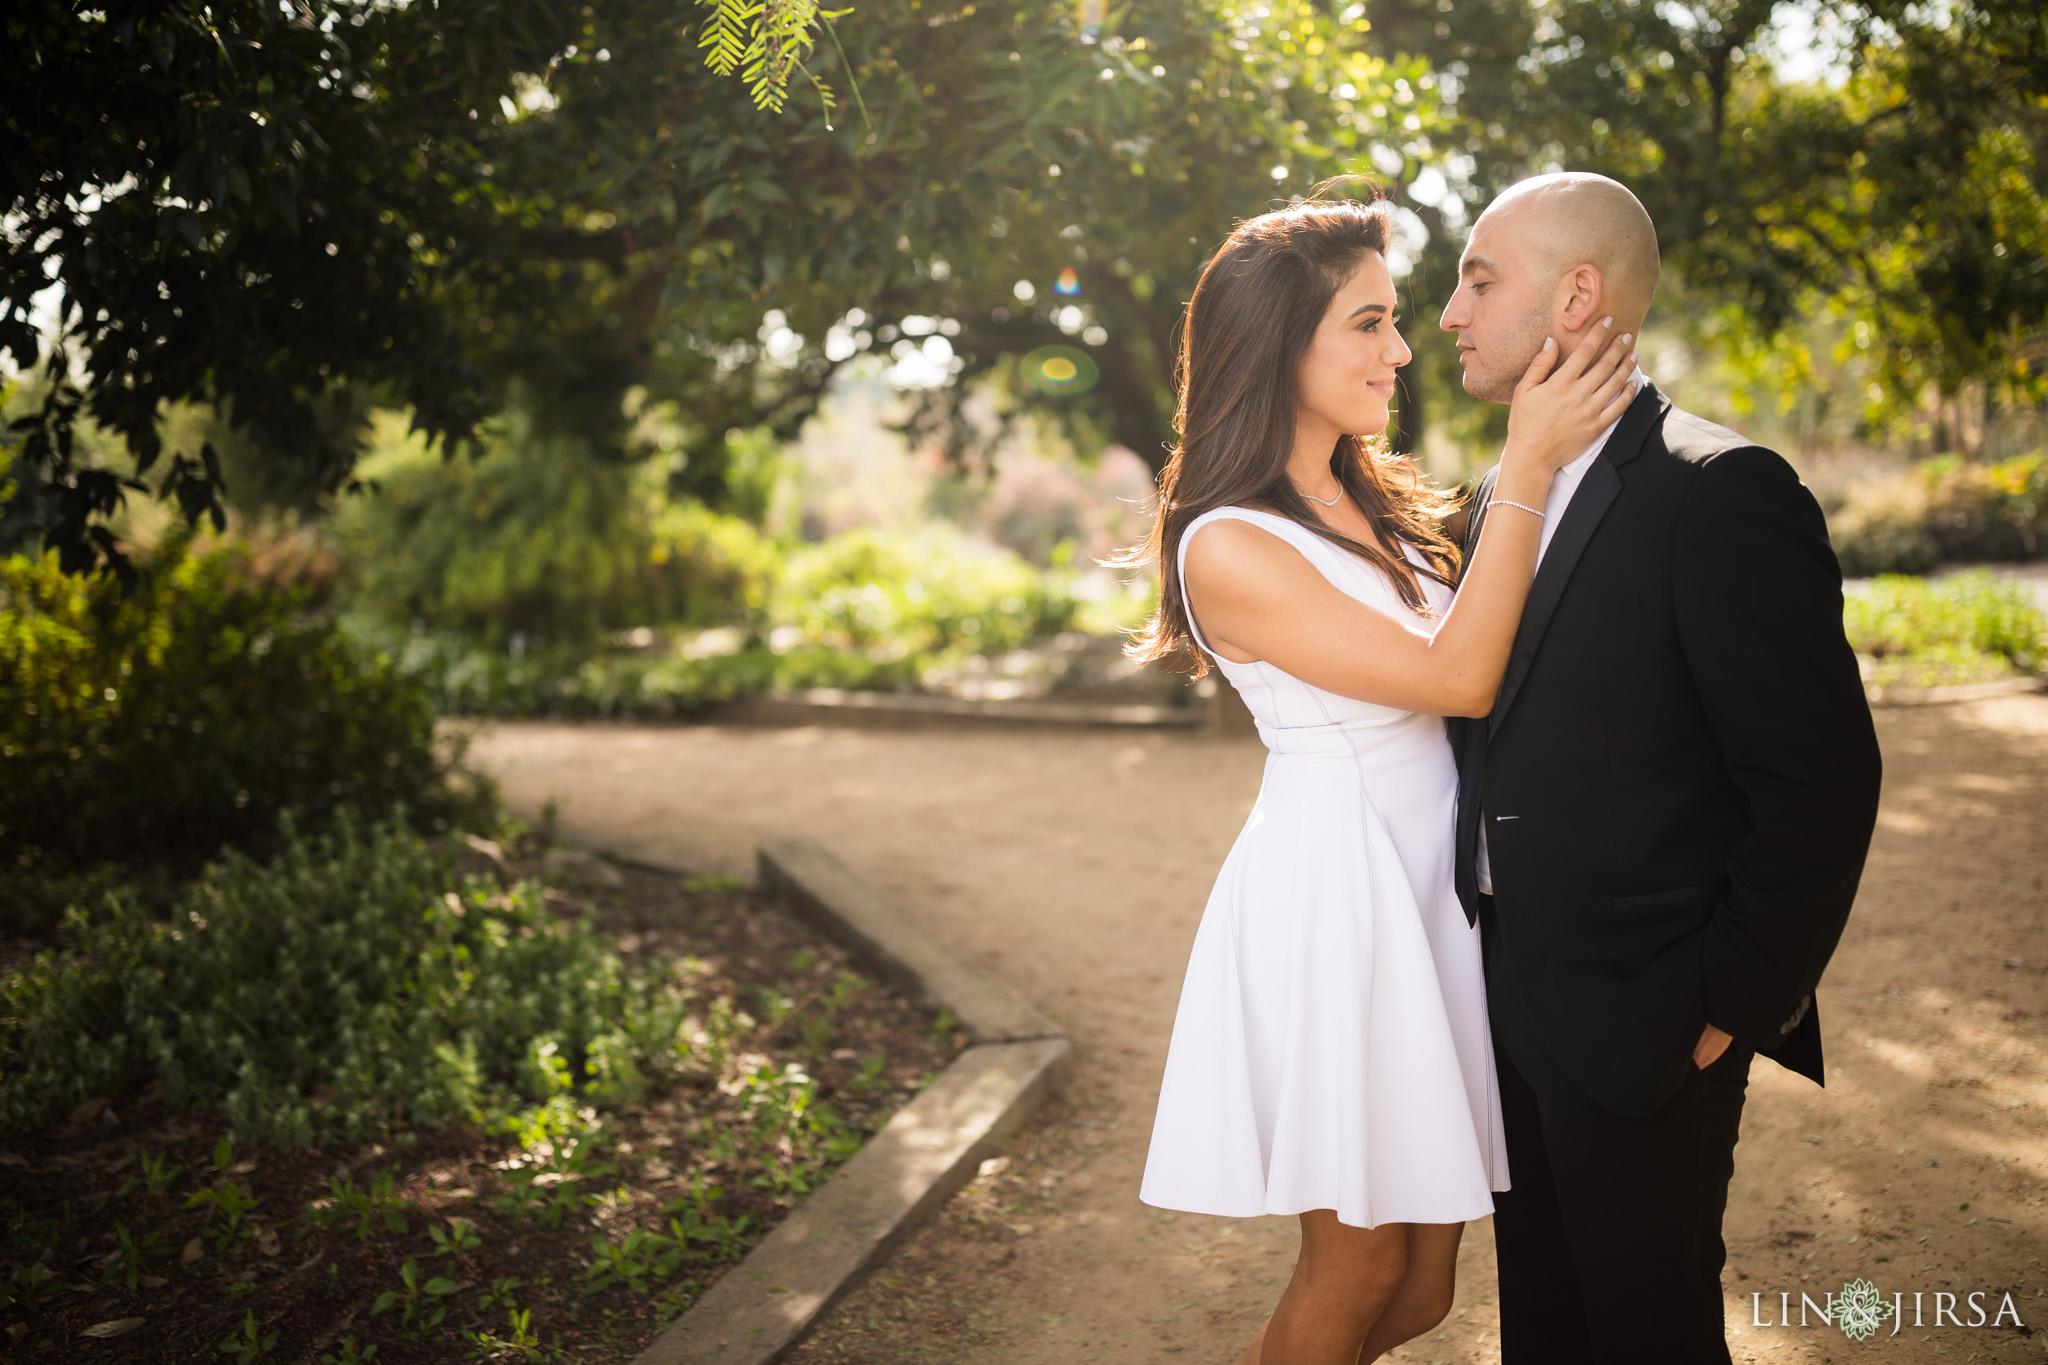 07-Los-angeles-arboretum-engagement-photography